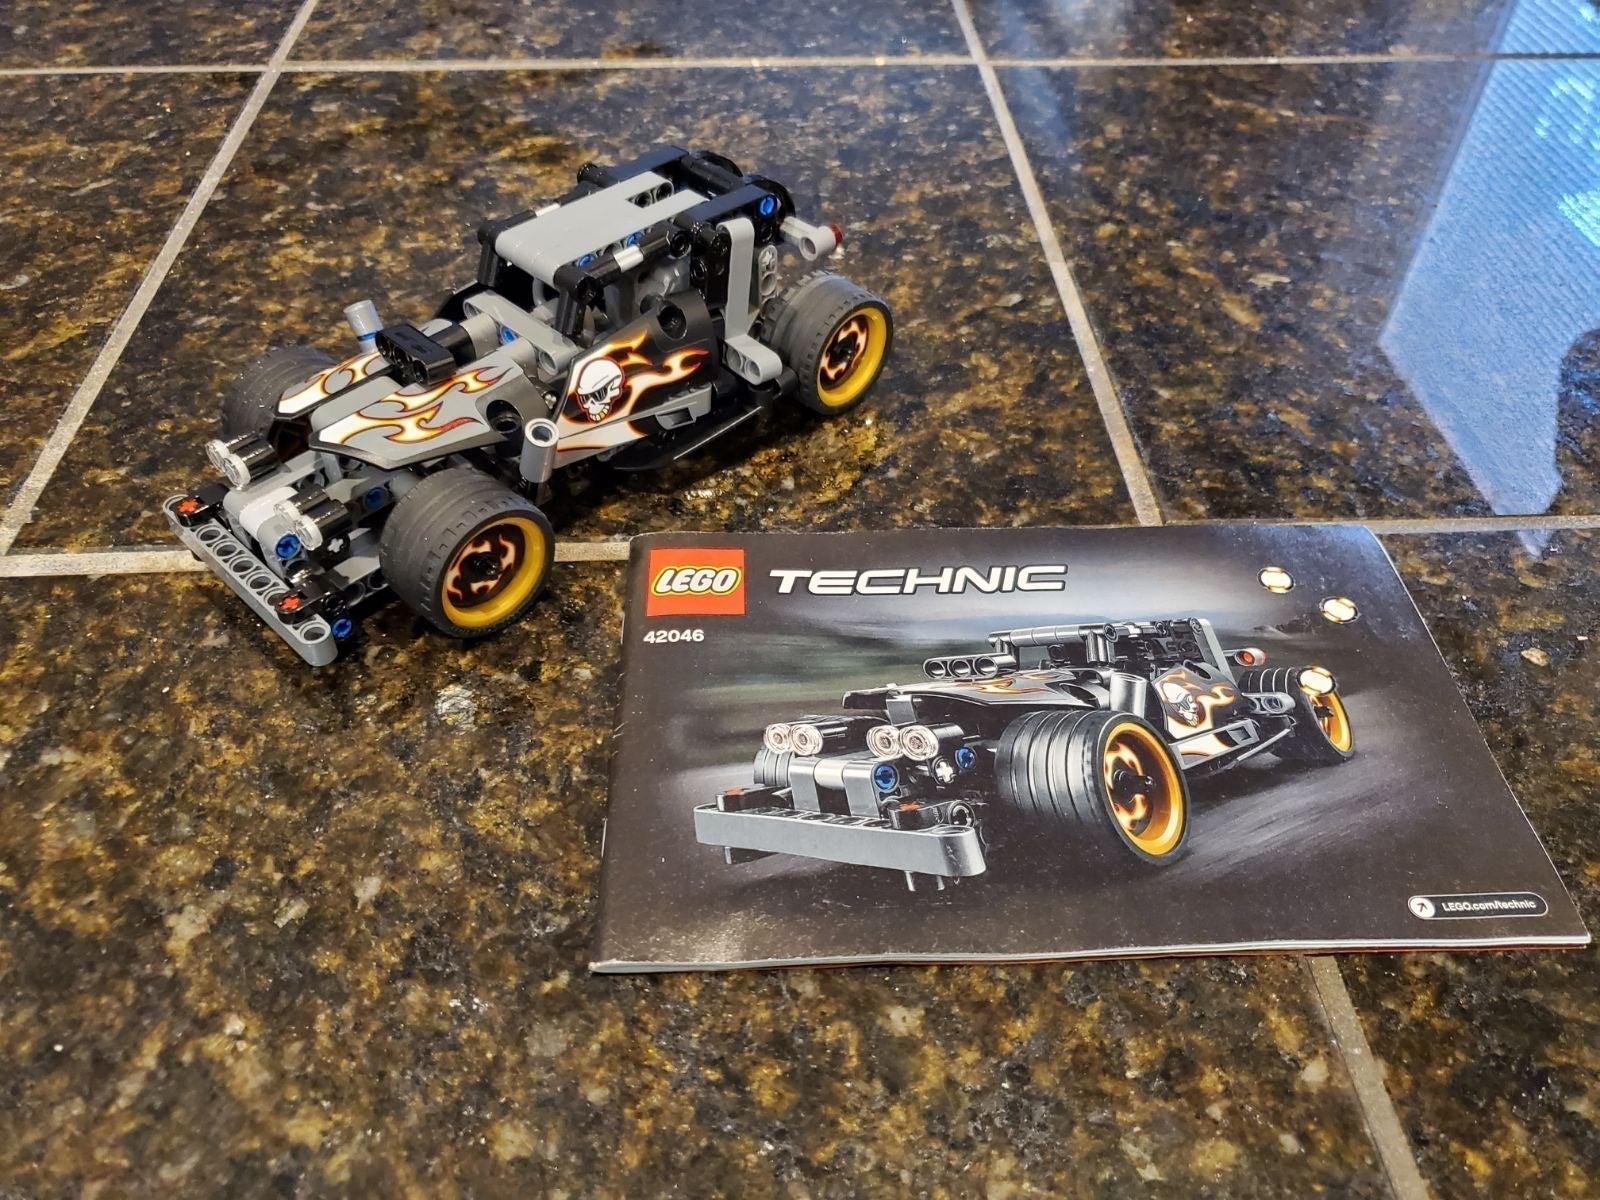 LEGO Technic: 42046